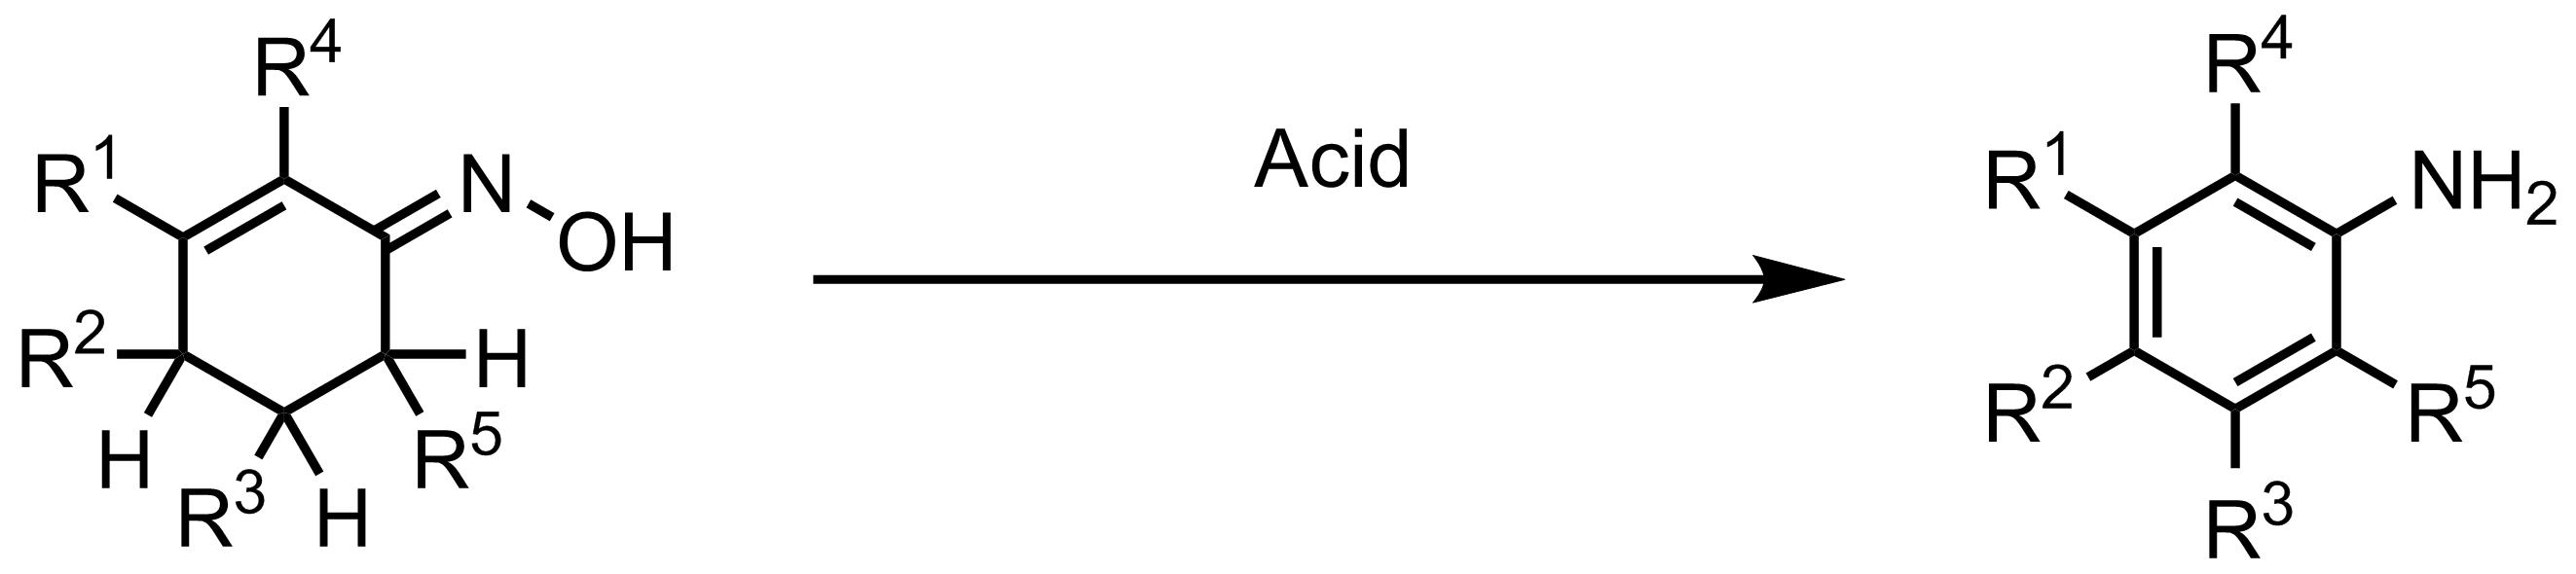 Schematic representation of the Semmler-Wolff Reaction.